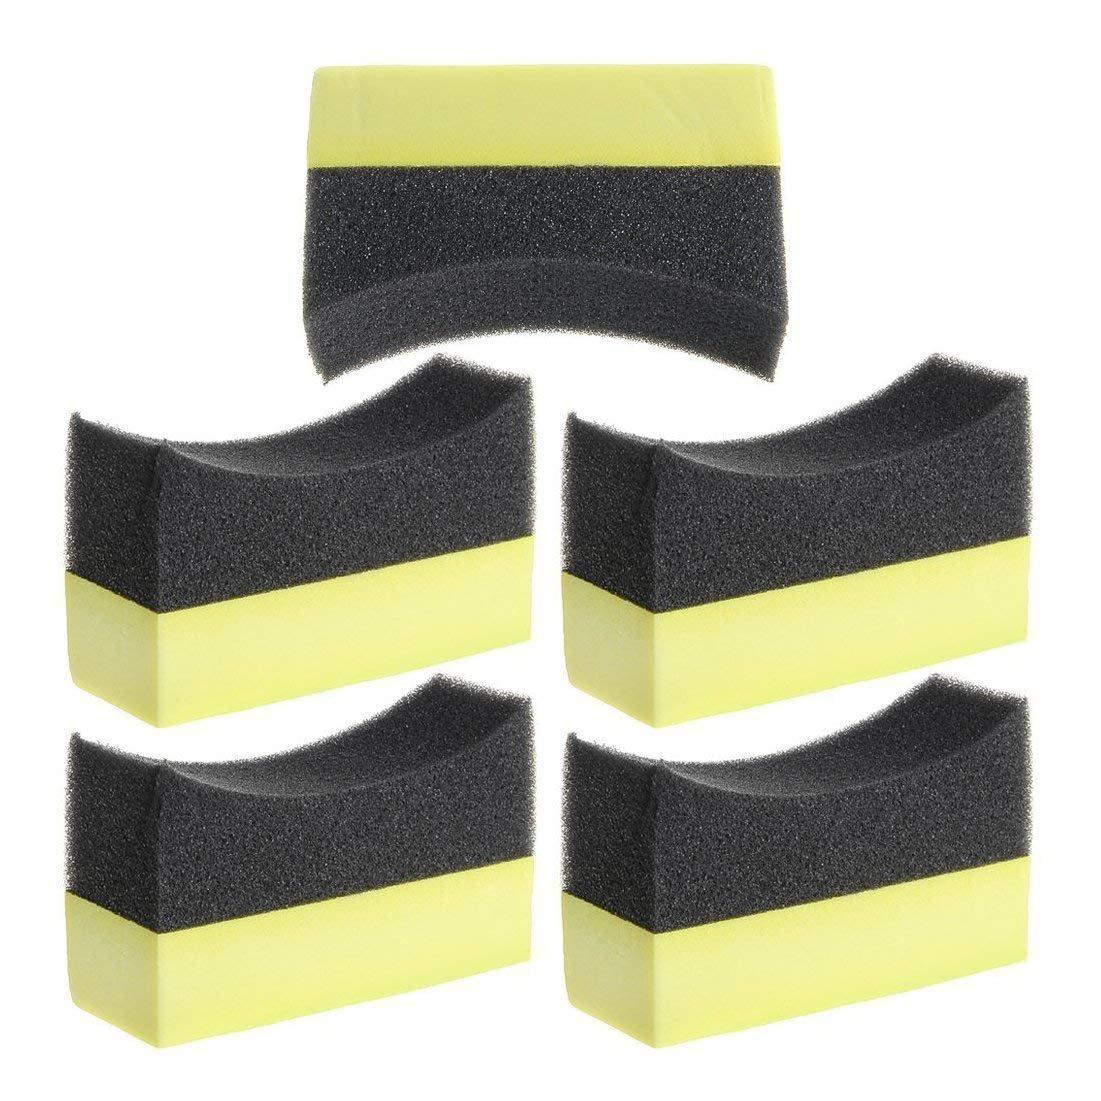 Yi-Qiu 5x Professional Automotive Car Wheel Washer Tyre Tire Dressing Applicator Curved Foam Sponge Pad Black+yellow